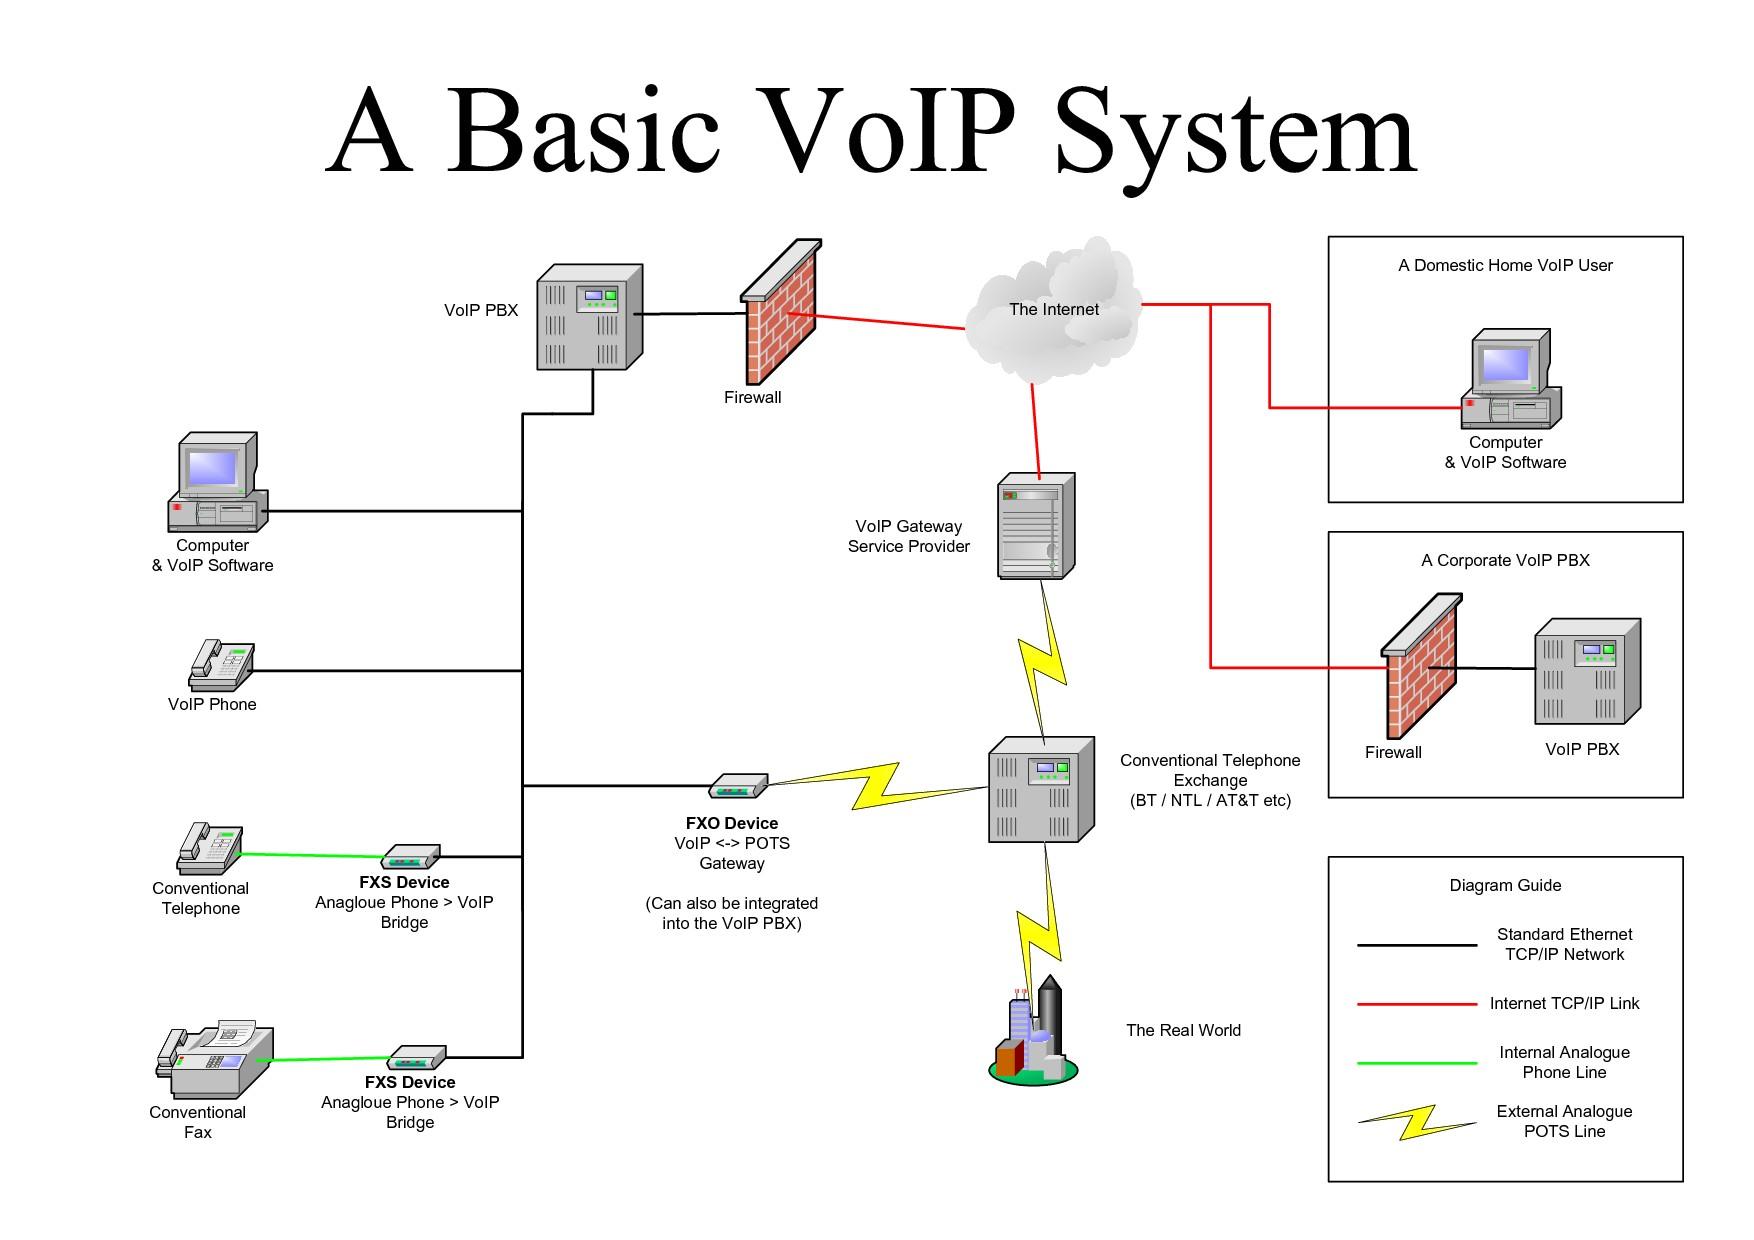 voip wiring diagram best of wiring diagram image rh mainetreasurechest com voip home wiring diagram voip telephone wiring diagram